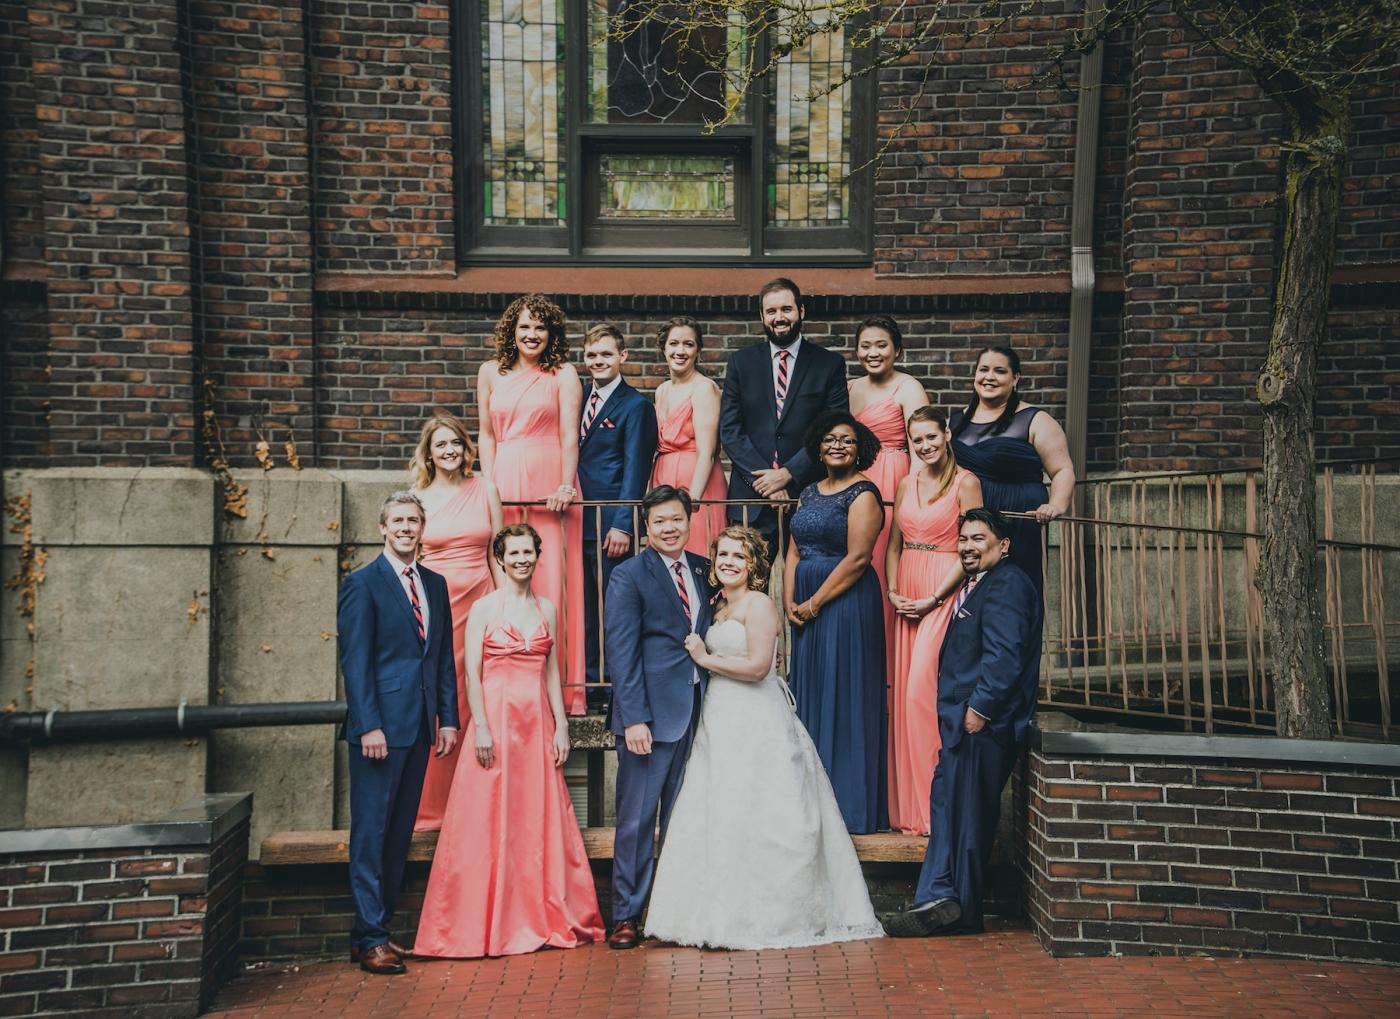 DSC_2209Everett_Wedding_Ballroom_Jane_Speleers_photography_Rachel_and_Edmund_Bridesmaids_peach_dresses_groomsmen_2017